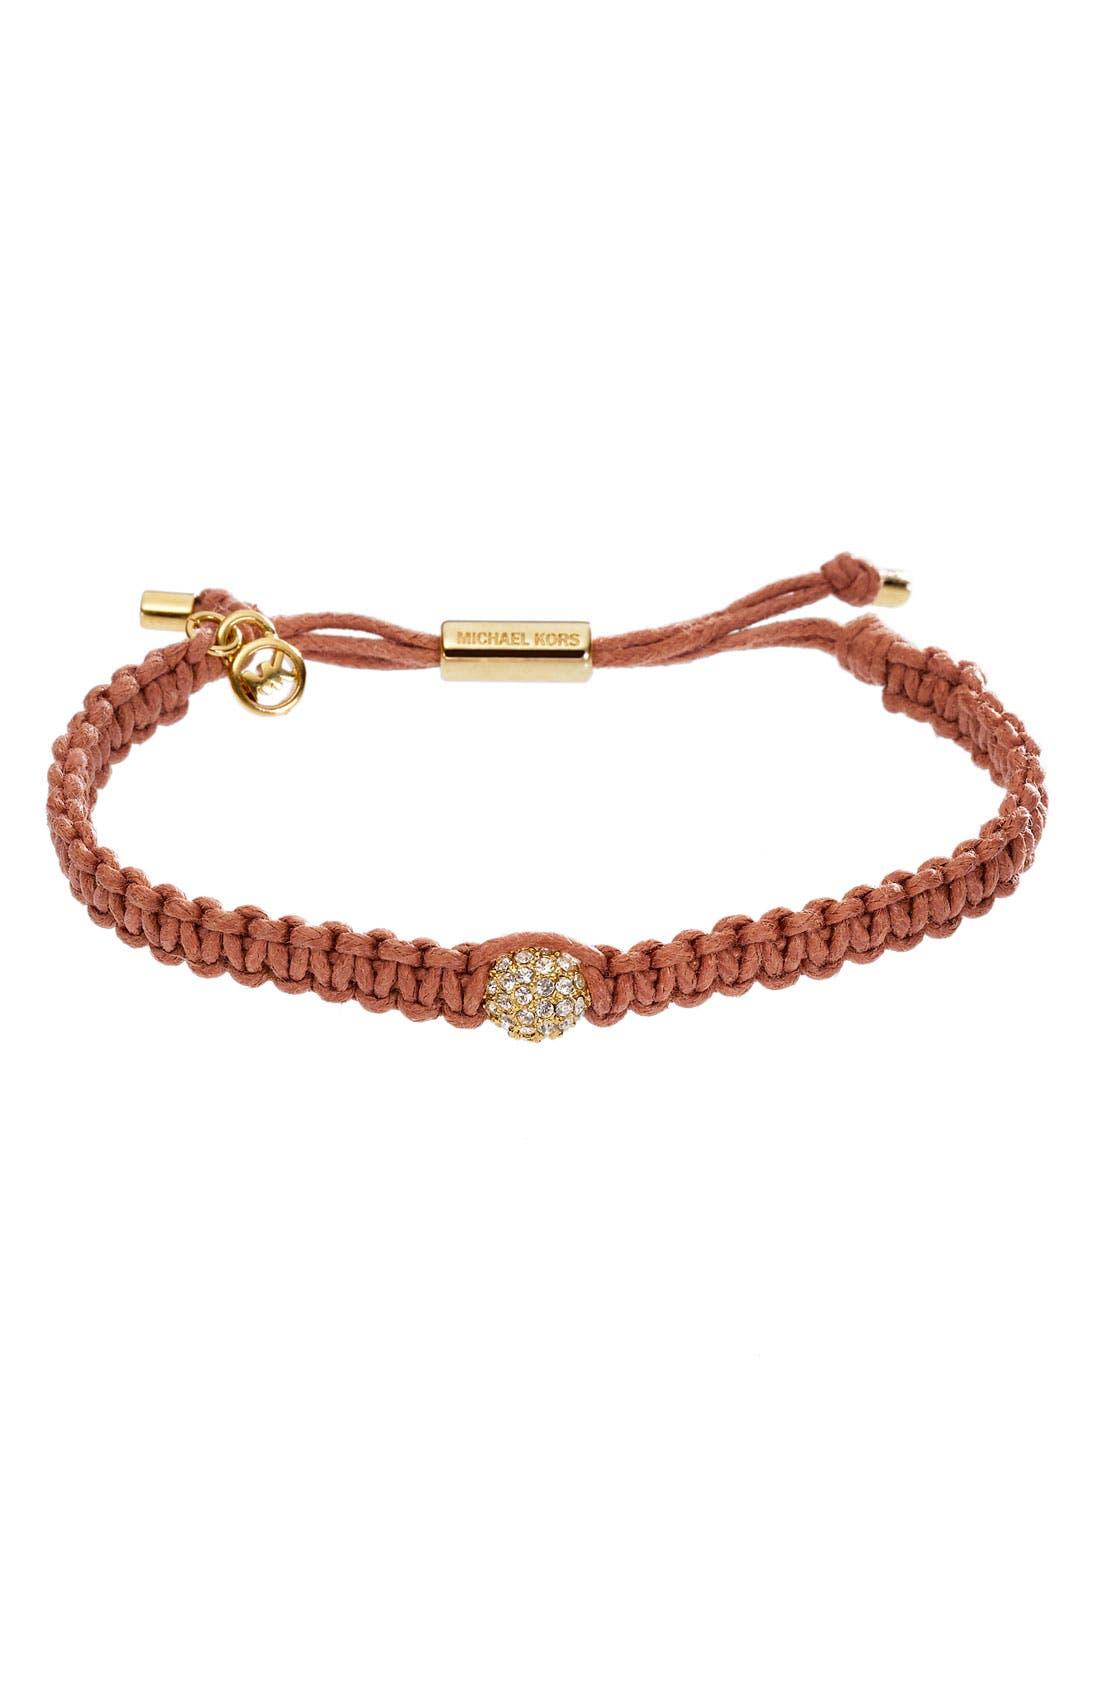 Alternate Image 1 Selected - Michael Kors 'Safari Glam' Adjustable Leather Cord Bracelet